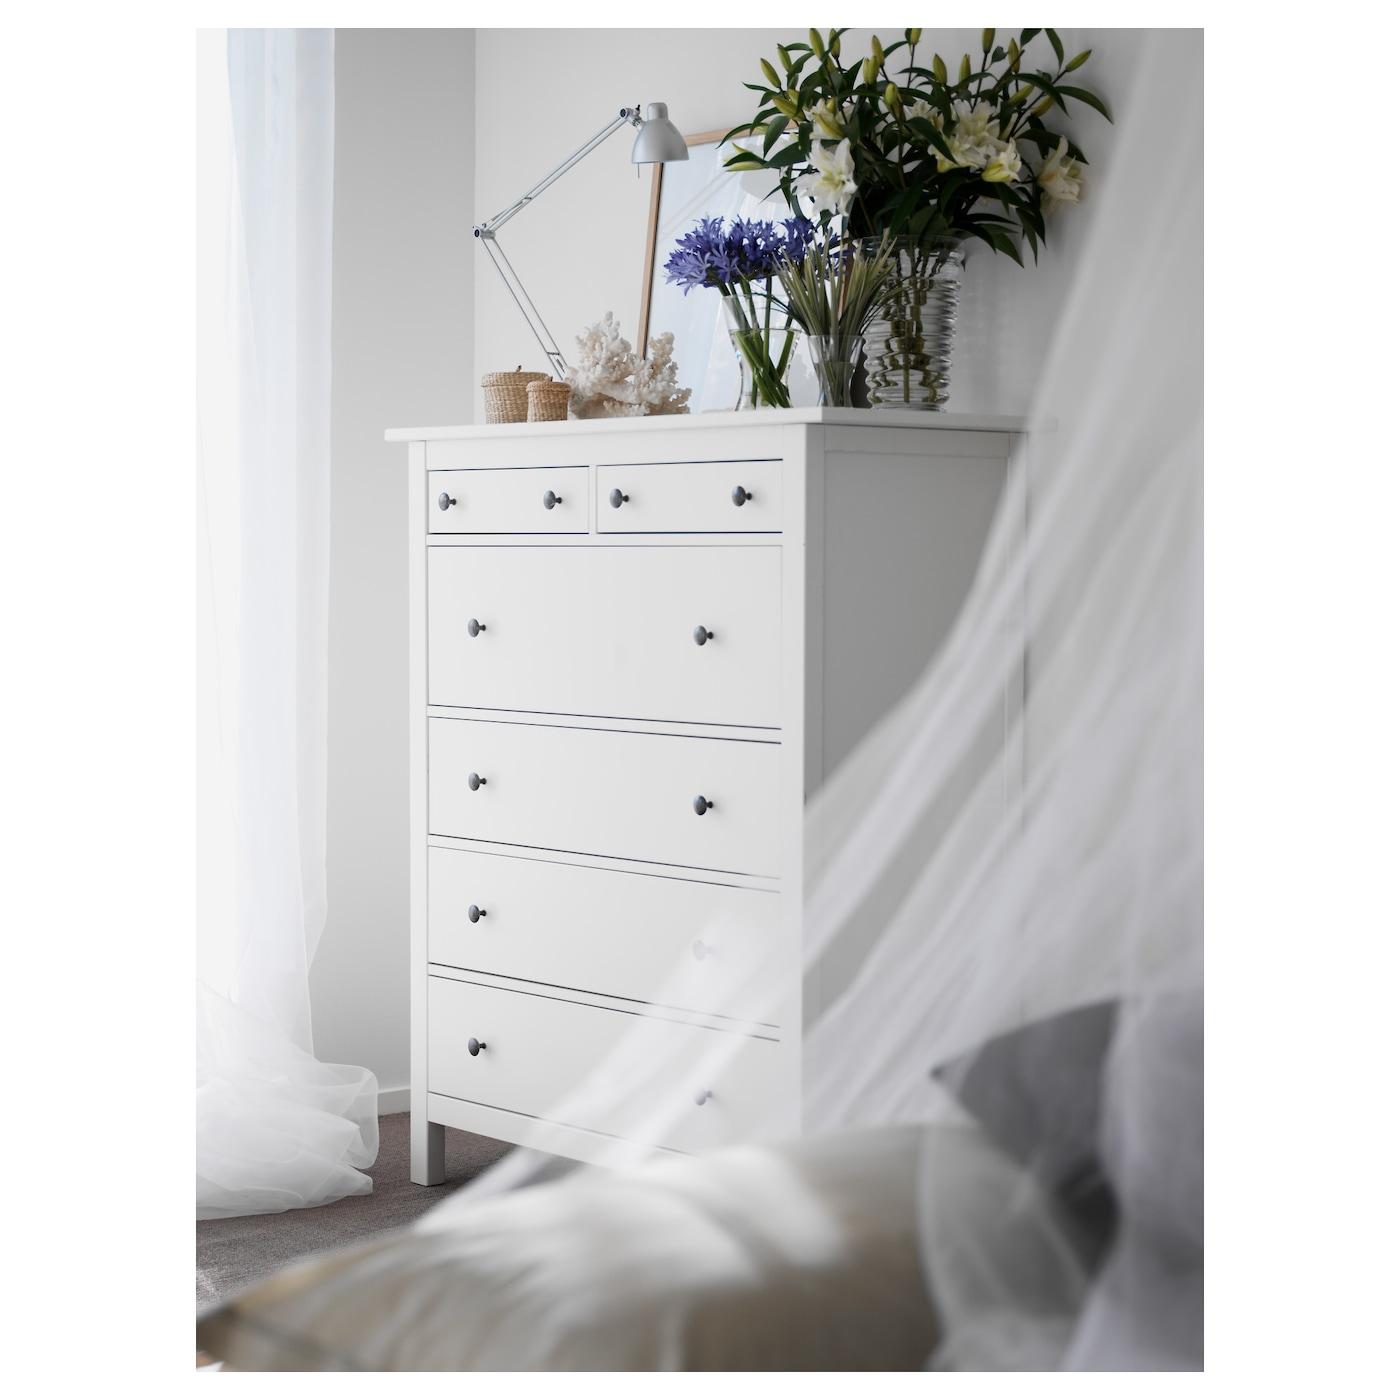 Hemnes 6 Drawer Chest White Stain 42 1 2x51 5 8 Ikea